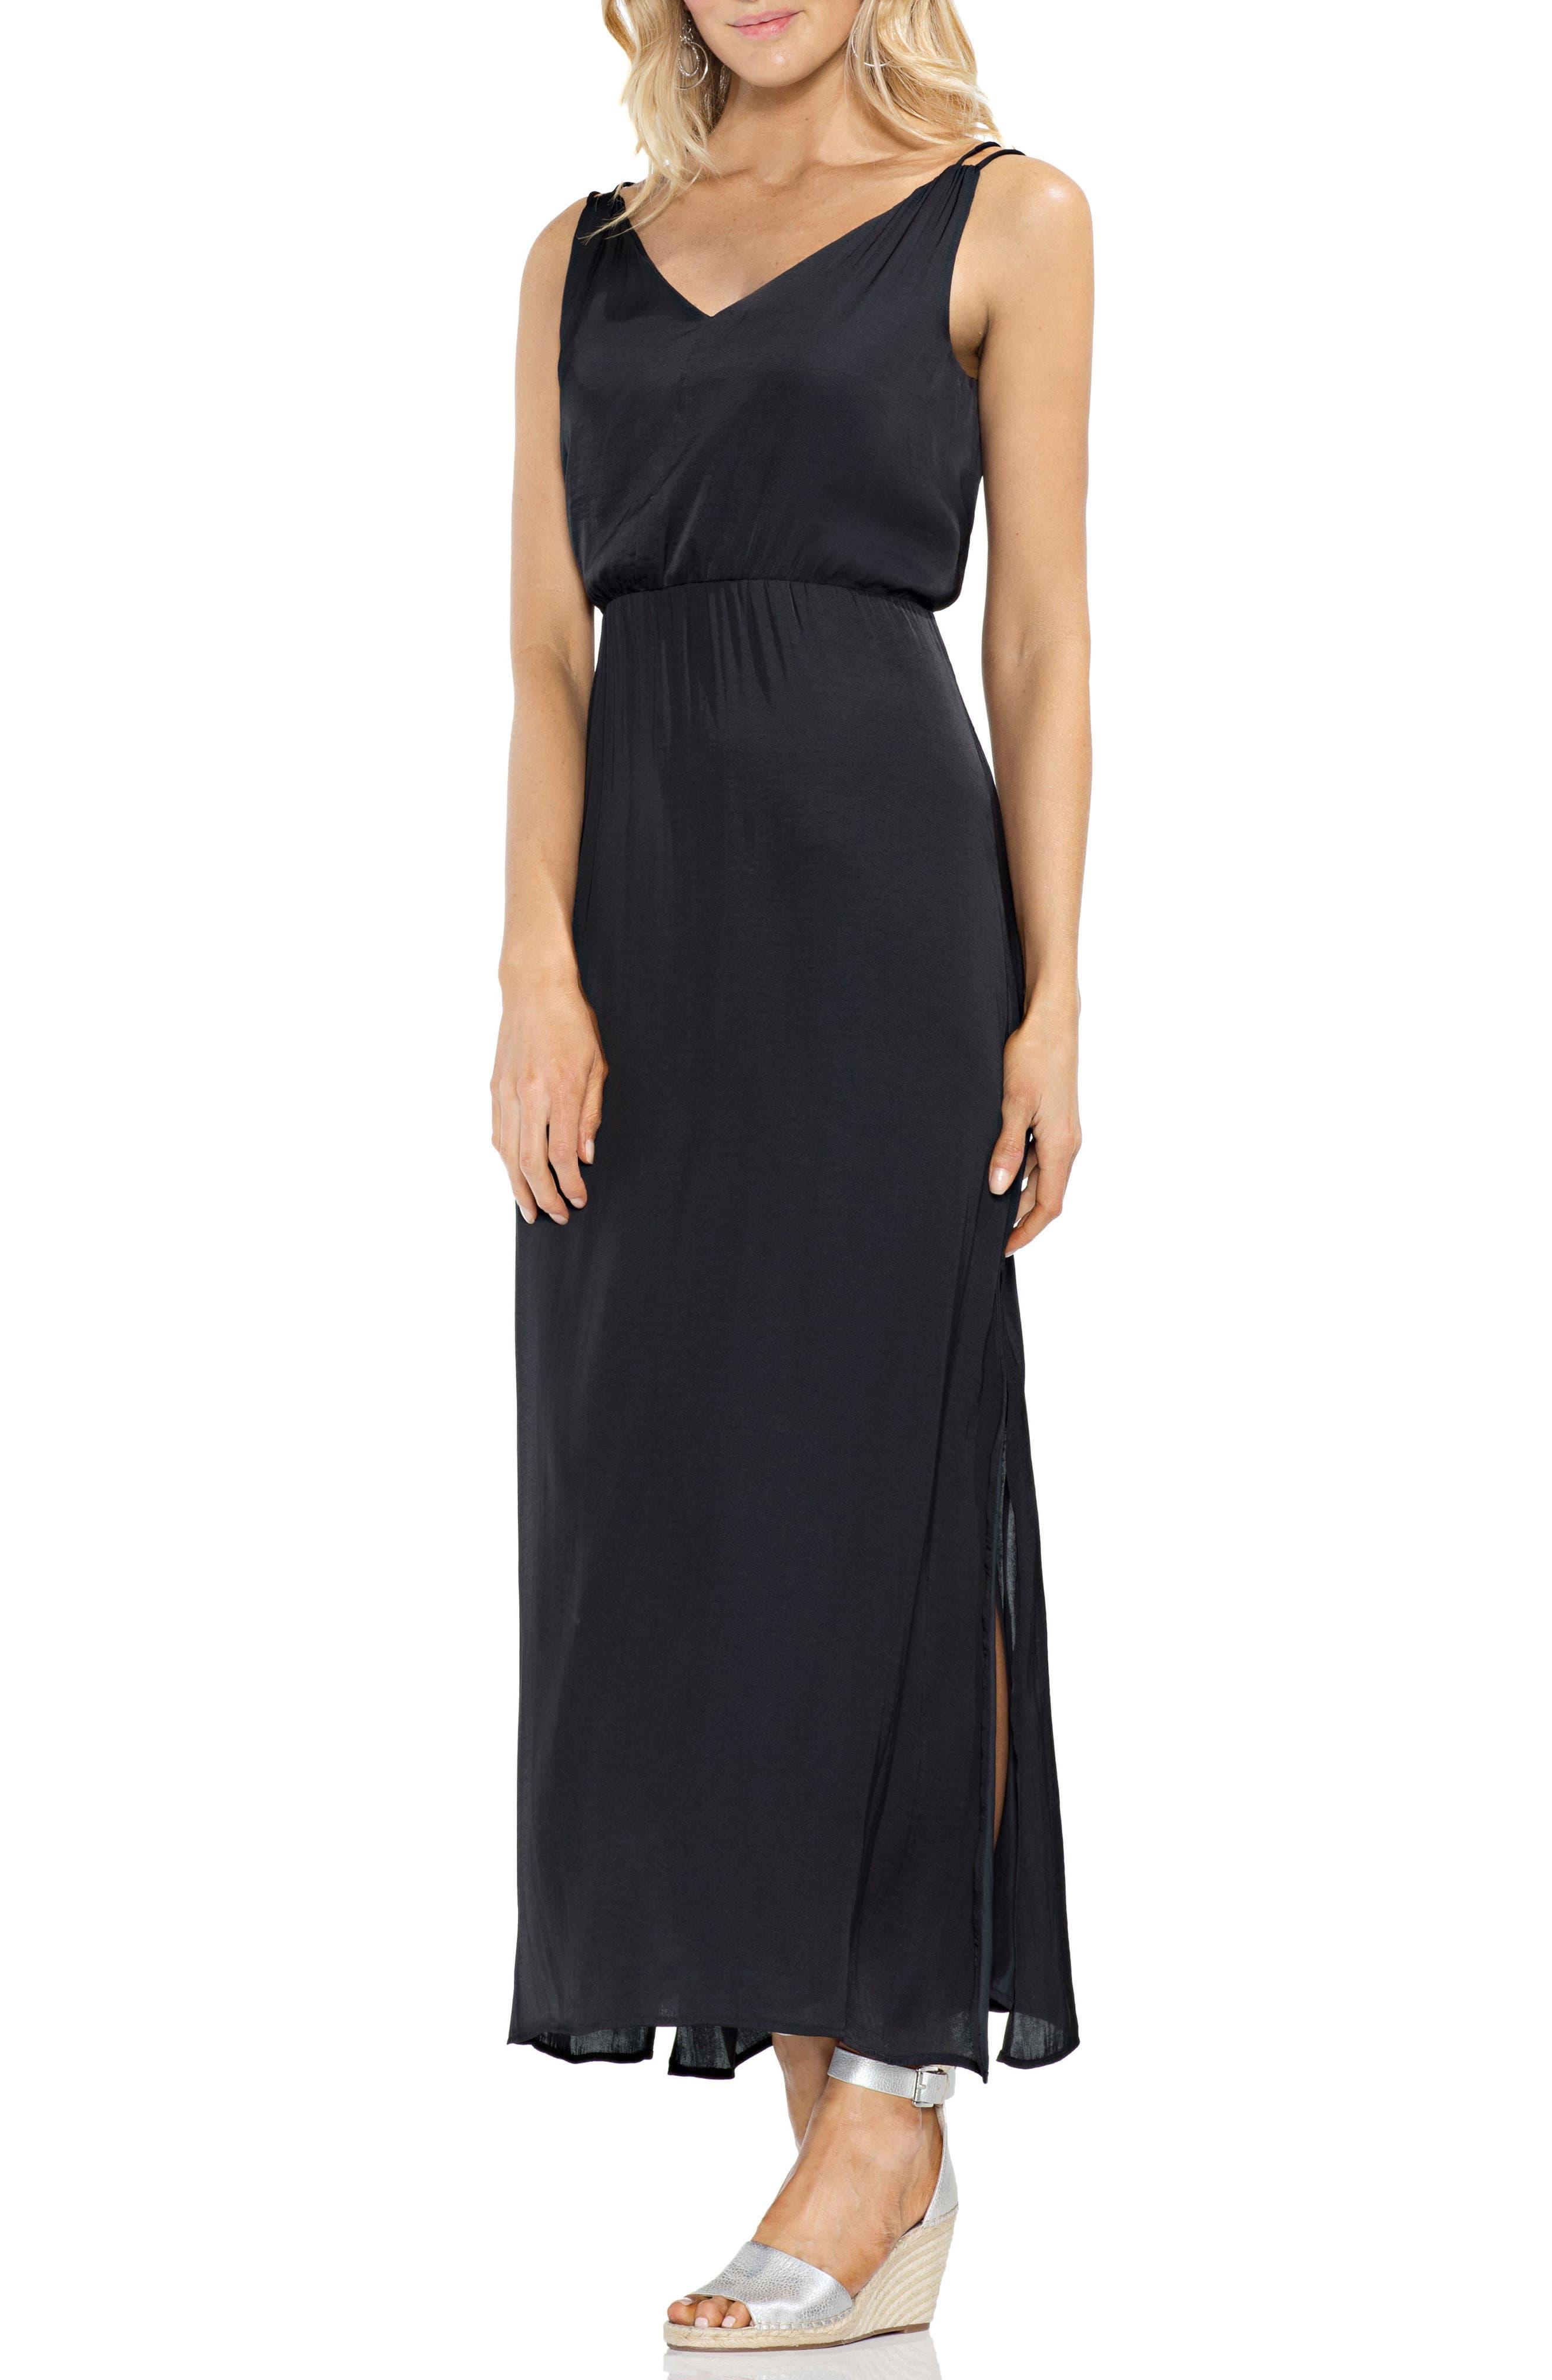 Rumple Satin Blouson Midi Dress,                             Main thumbnail 1, color,                             Rich Black